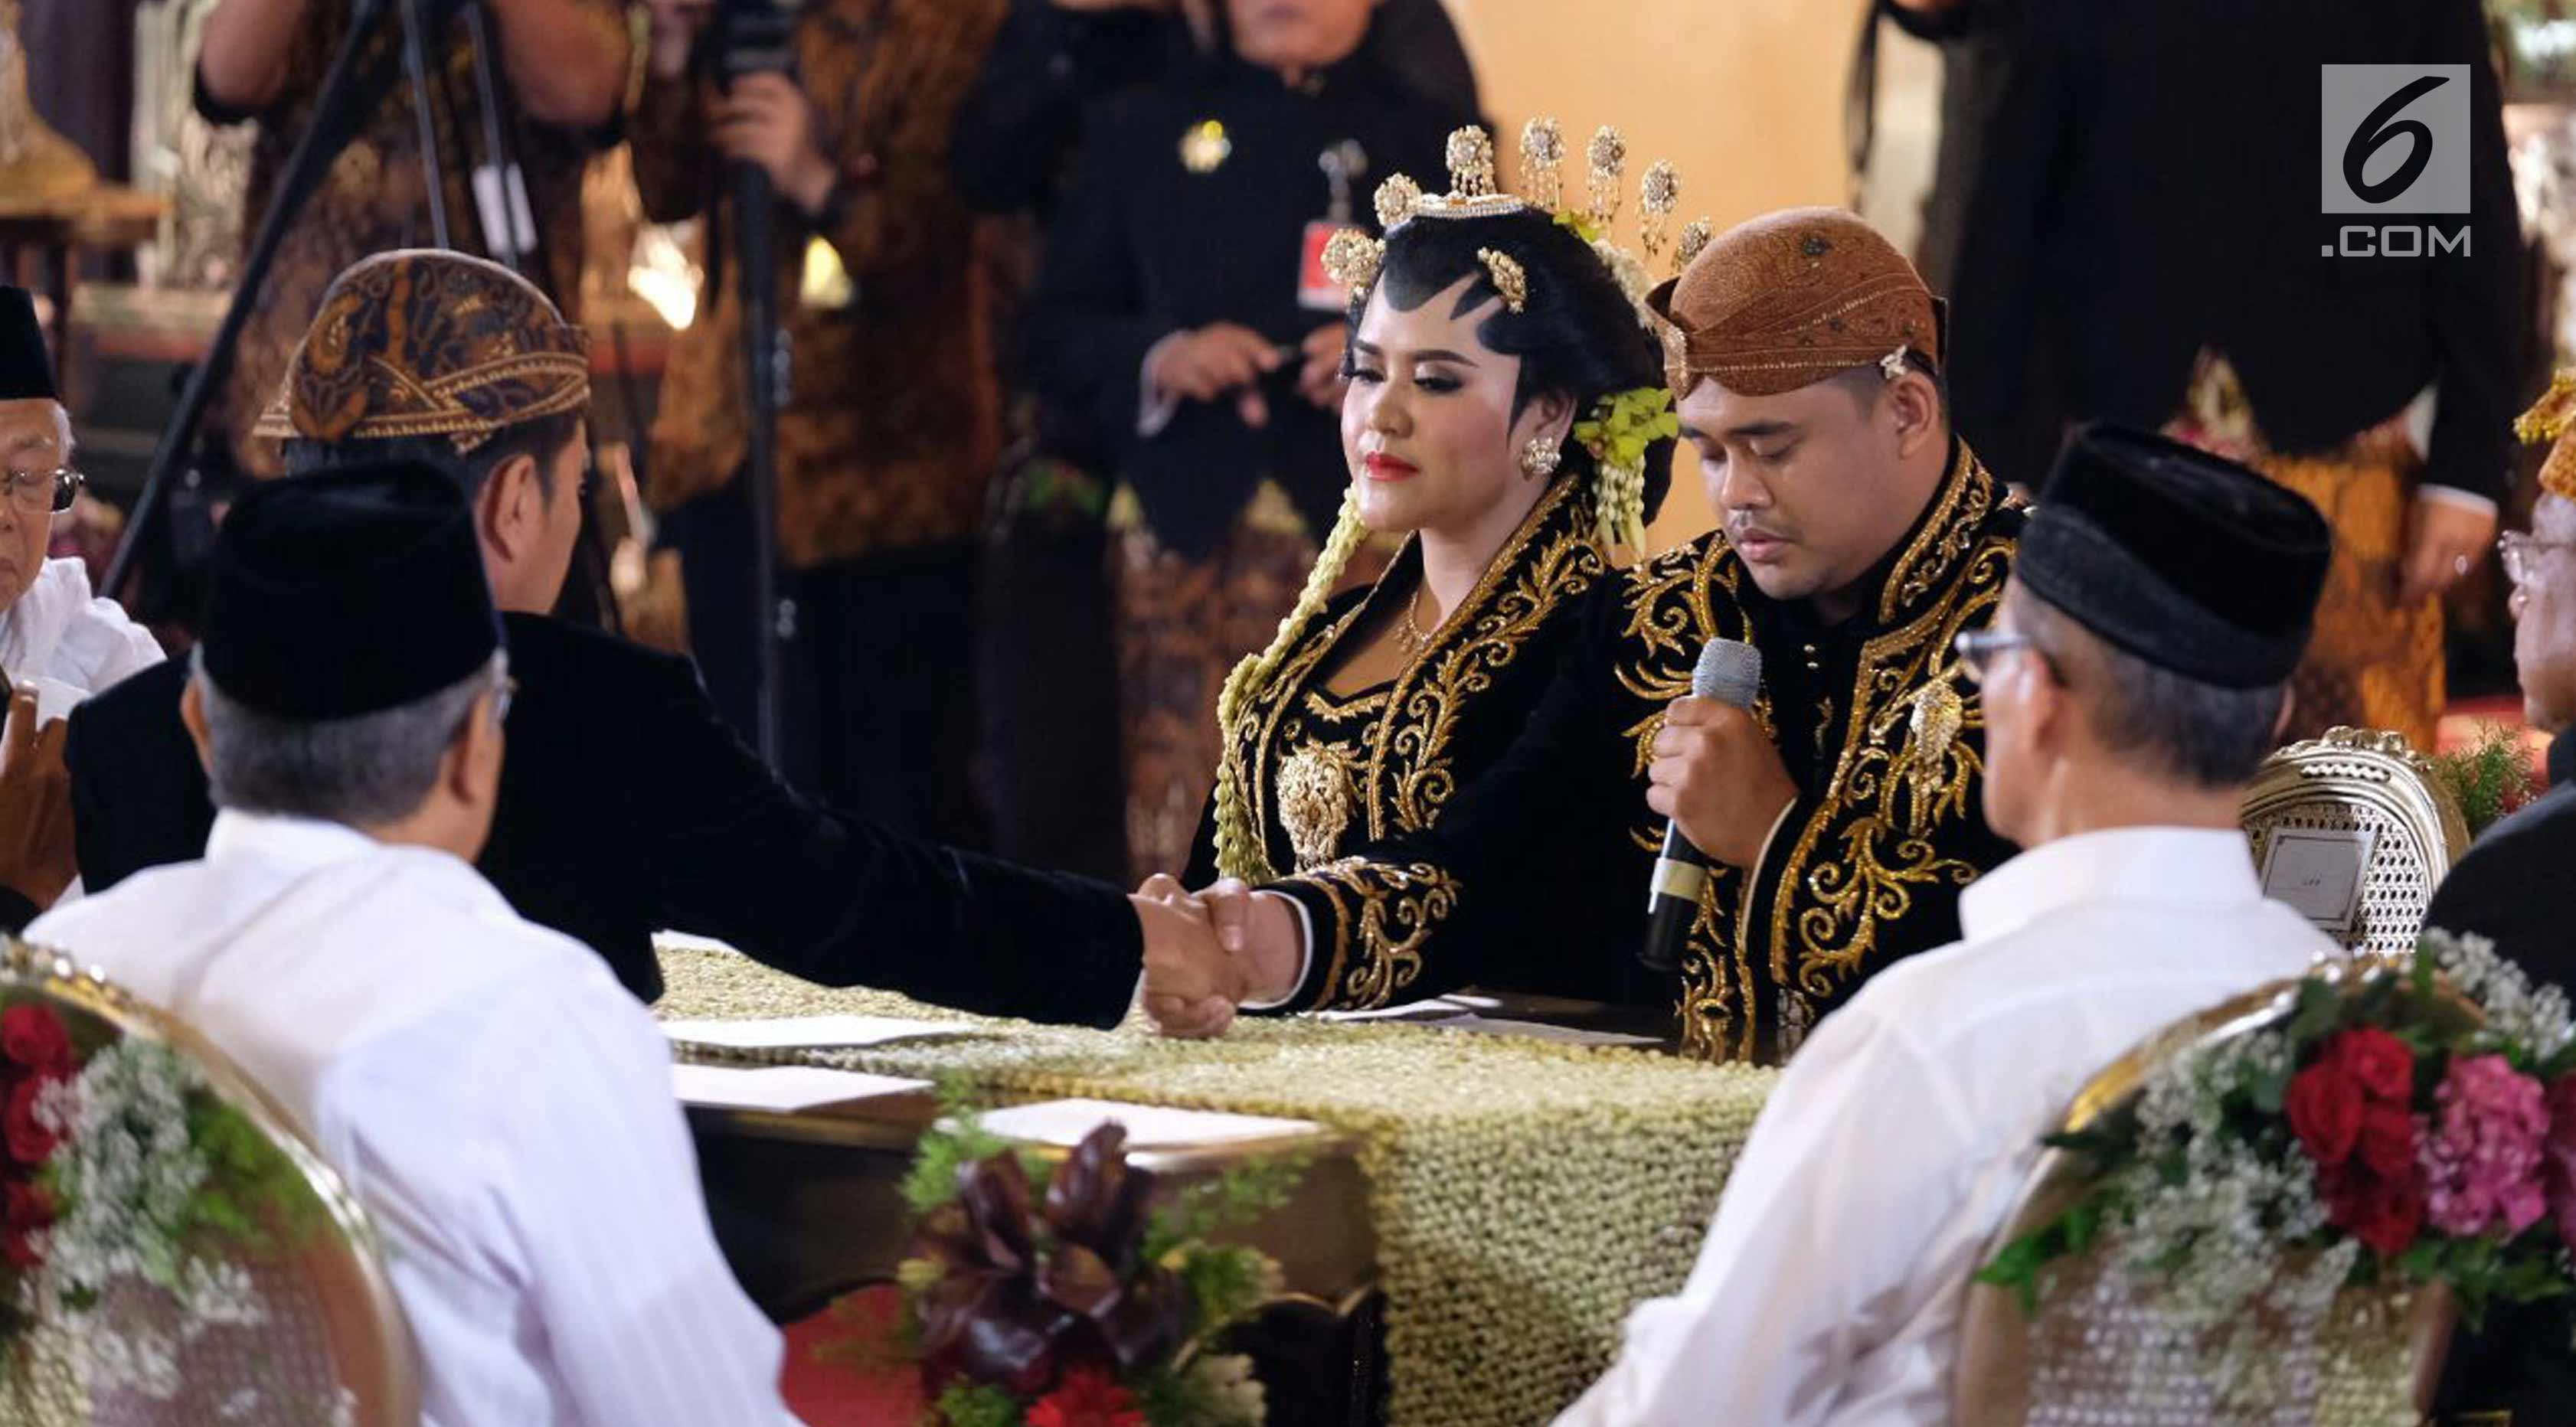 Presiden Joko Widodo saat menikahkan putrinya, Kahiyang Ayu dengan Bobby Nasution dalam prosesi ijab kabul di Gedung Graha Saba, Solo, Jawa Tengah, Rabu (8/11). (Liputan6.com/Pool/Jimboengphoto)